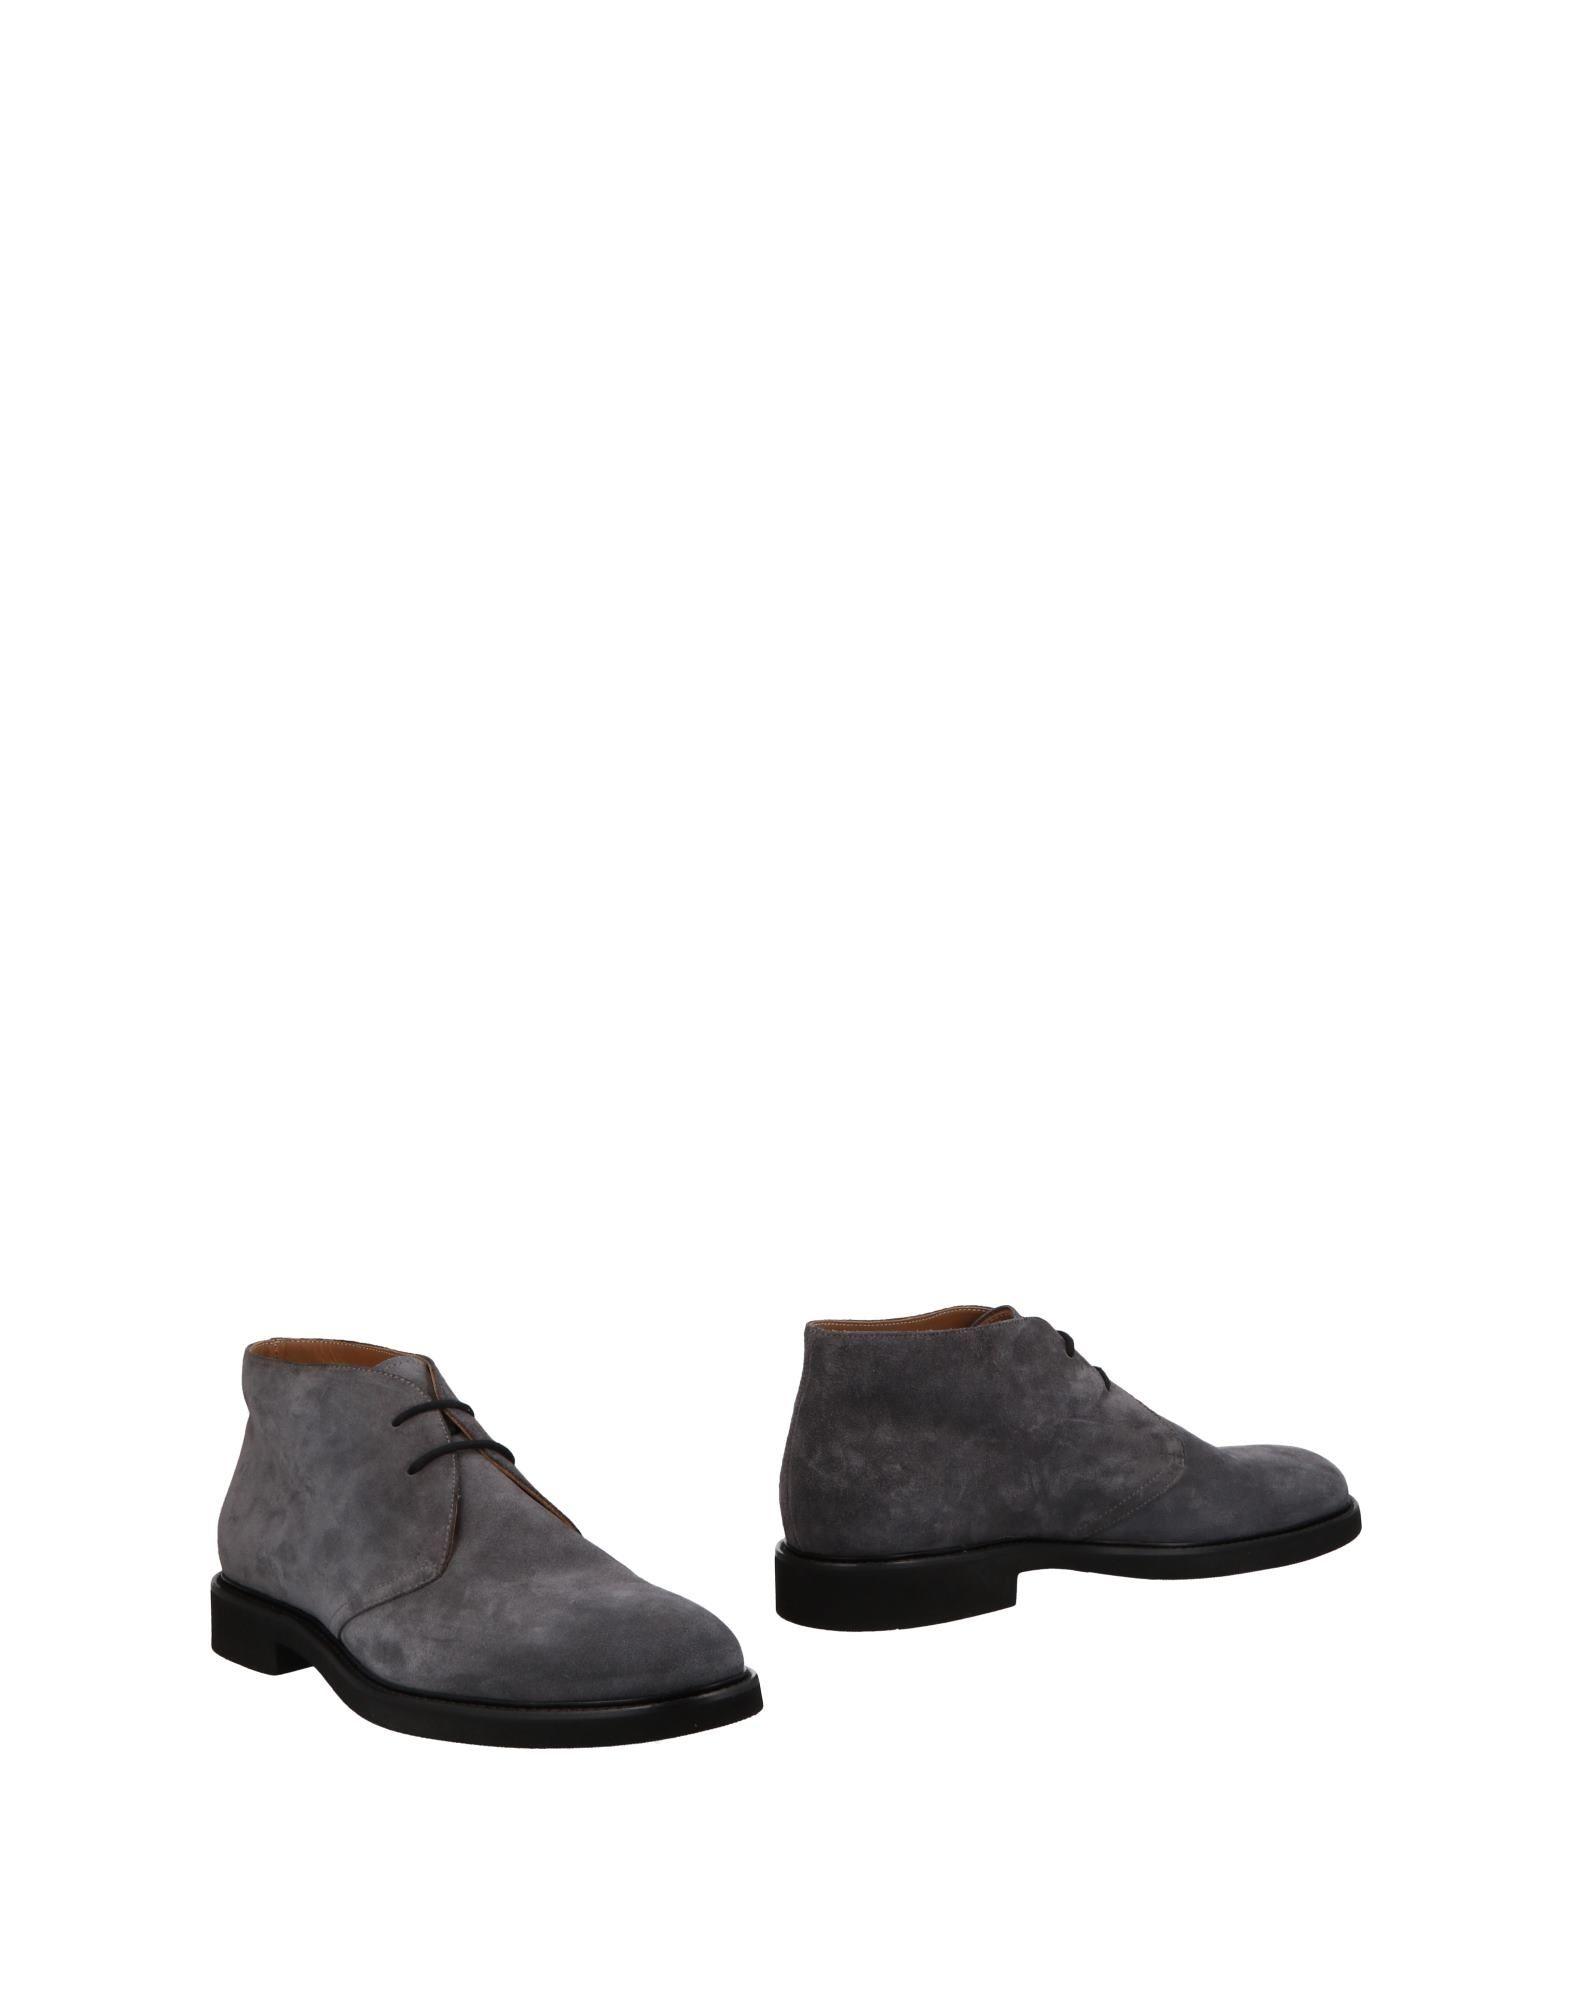 Doucal's Boots - Men Doucal's Boots online 11250024HA on  Australia - 11250024HA online c96be6